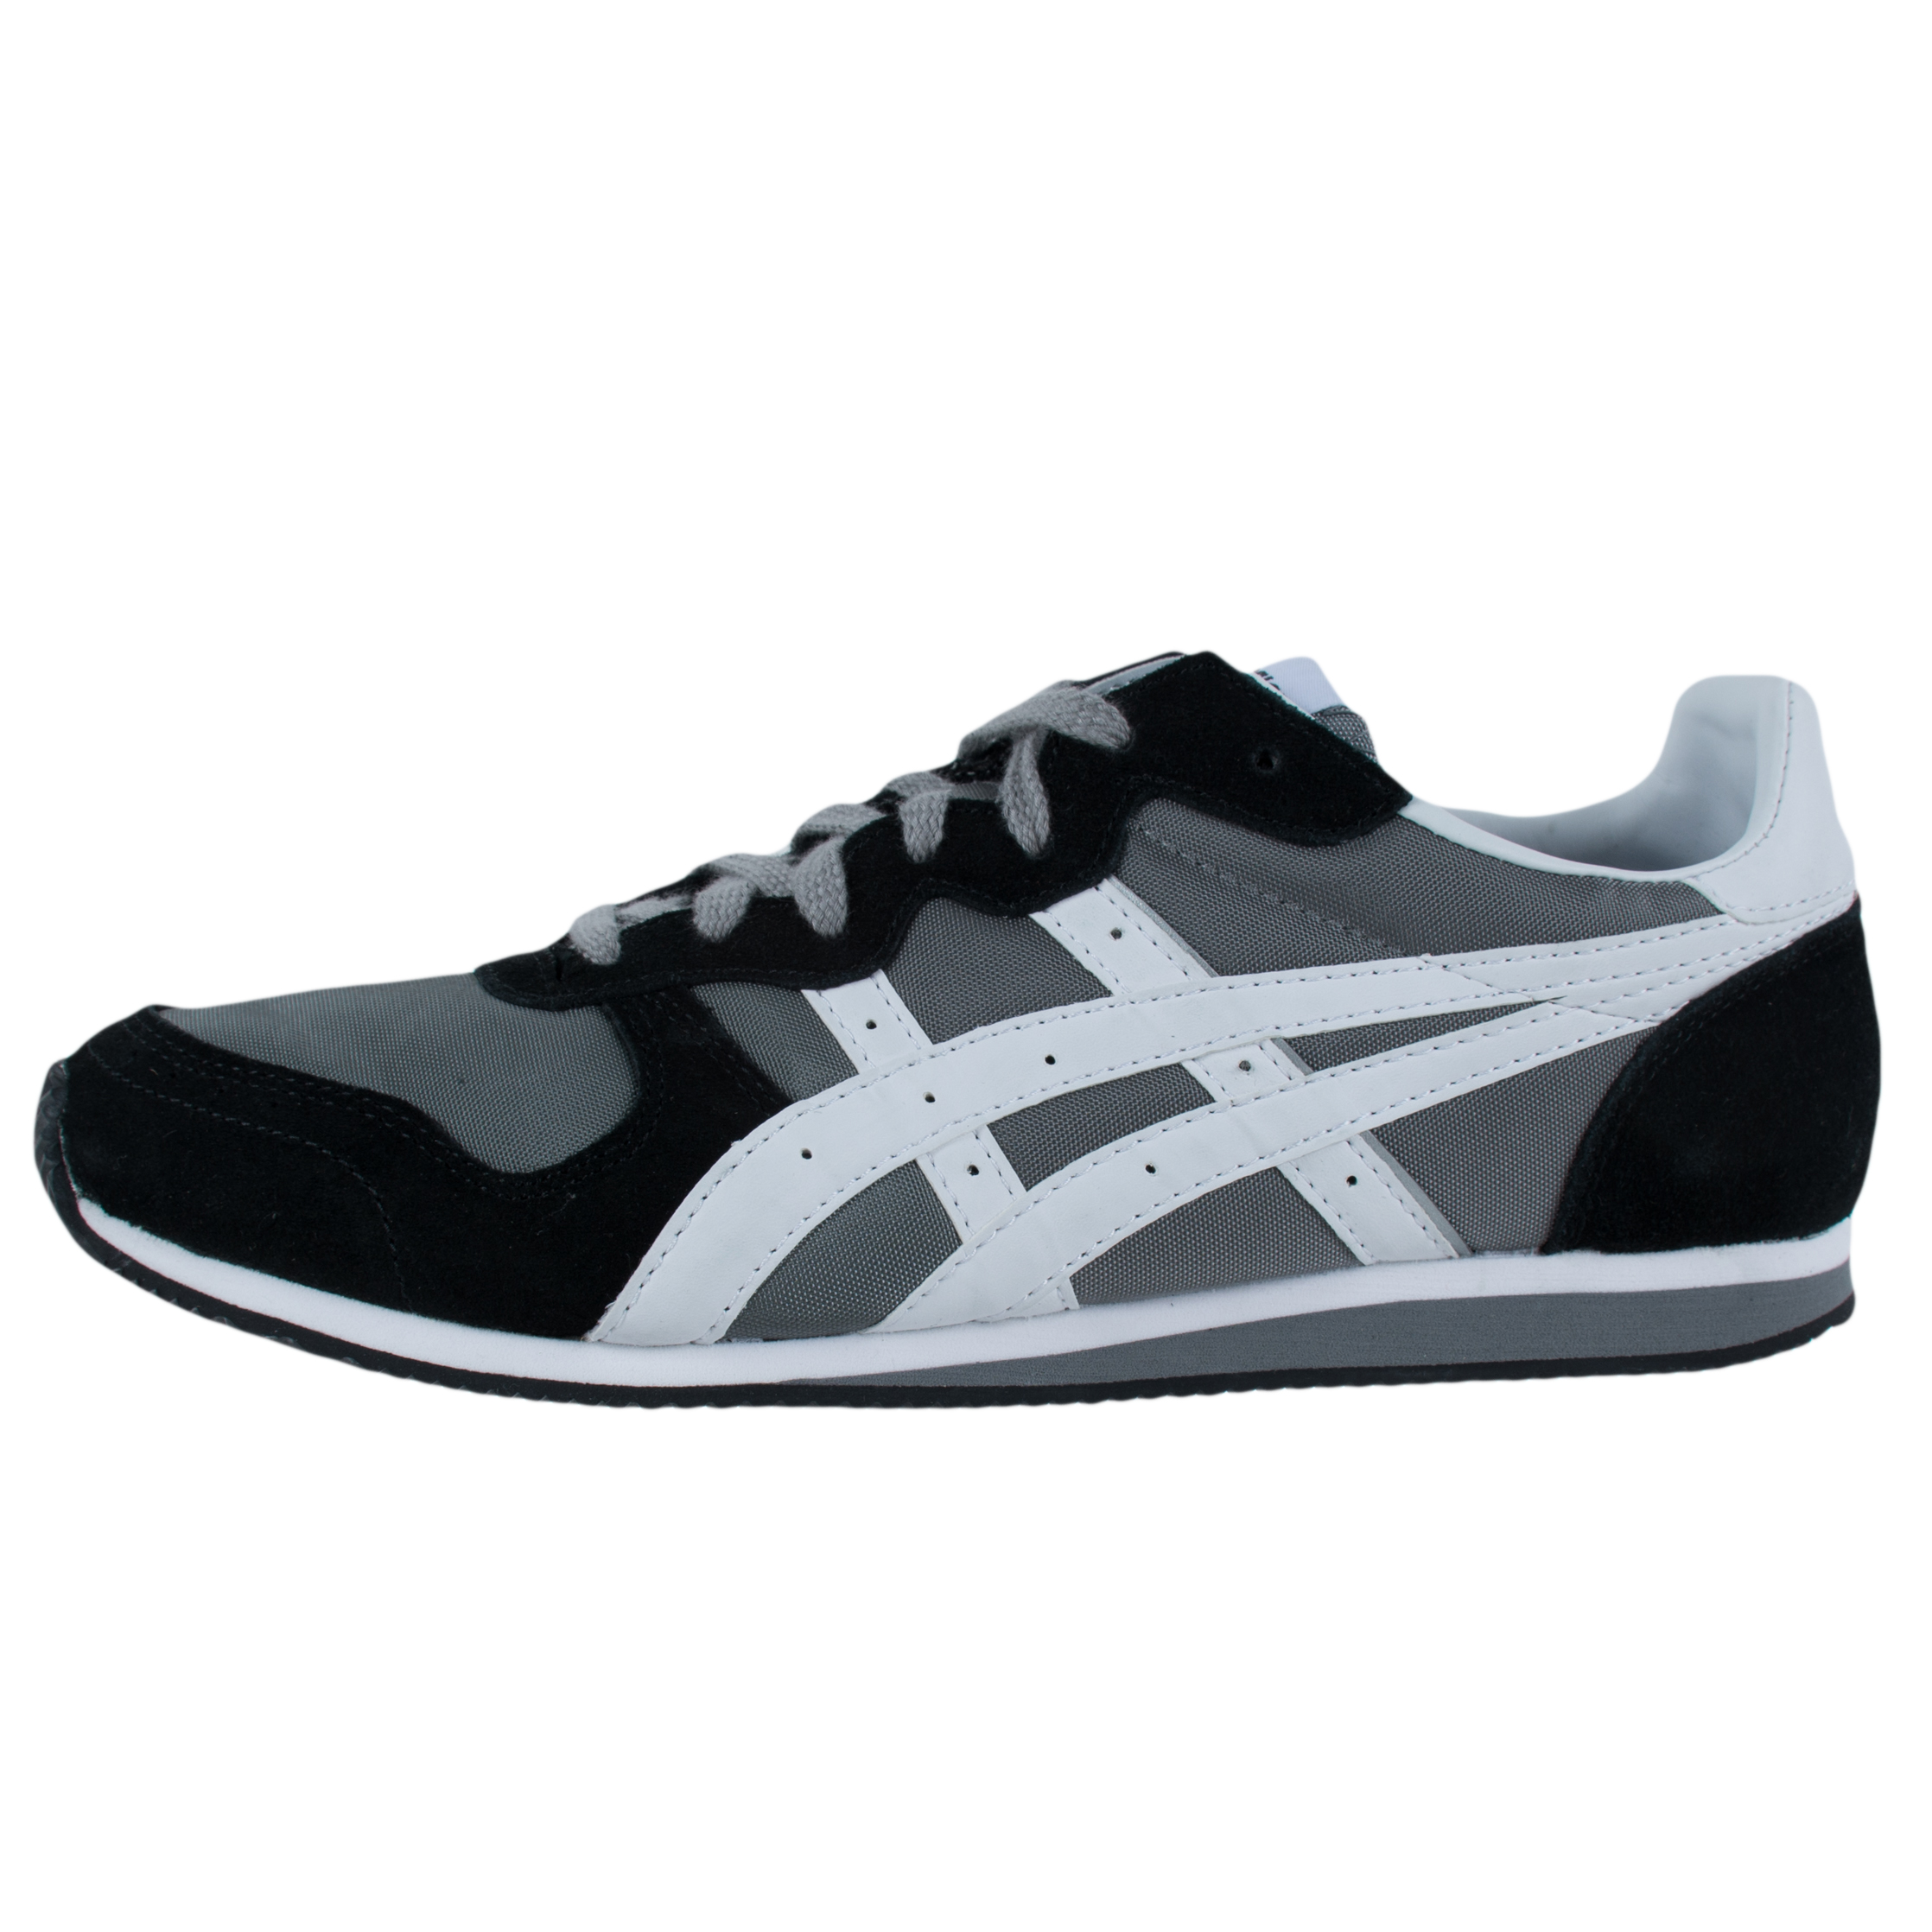 Asics Corrido Sneakers